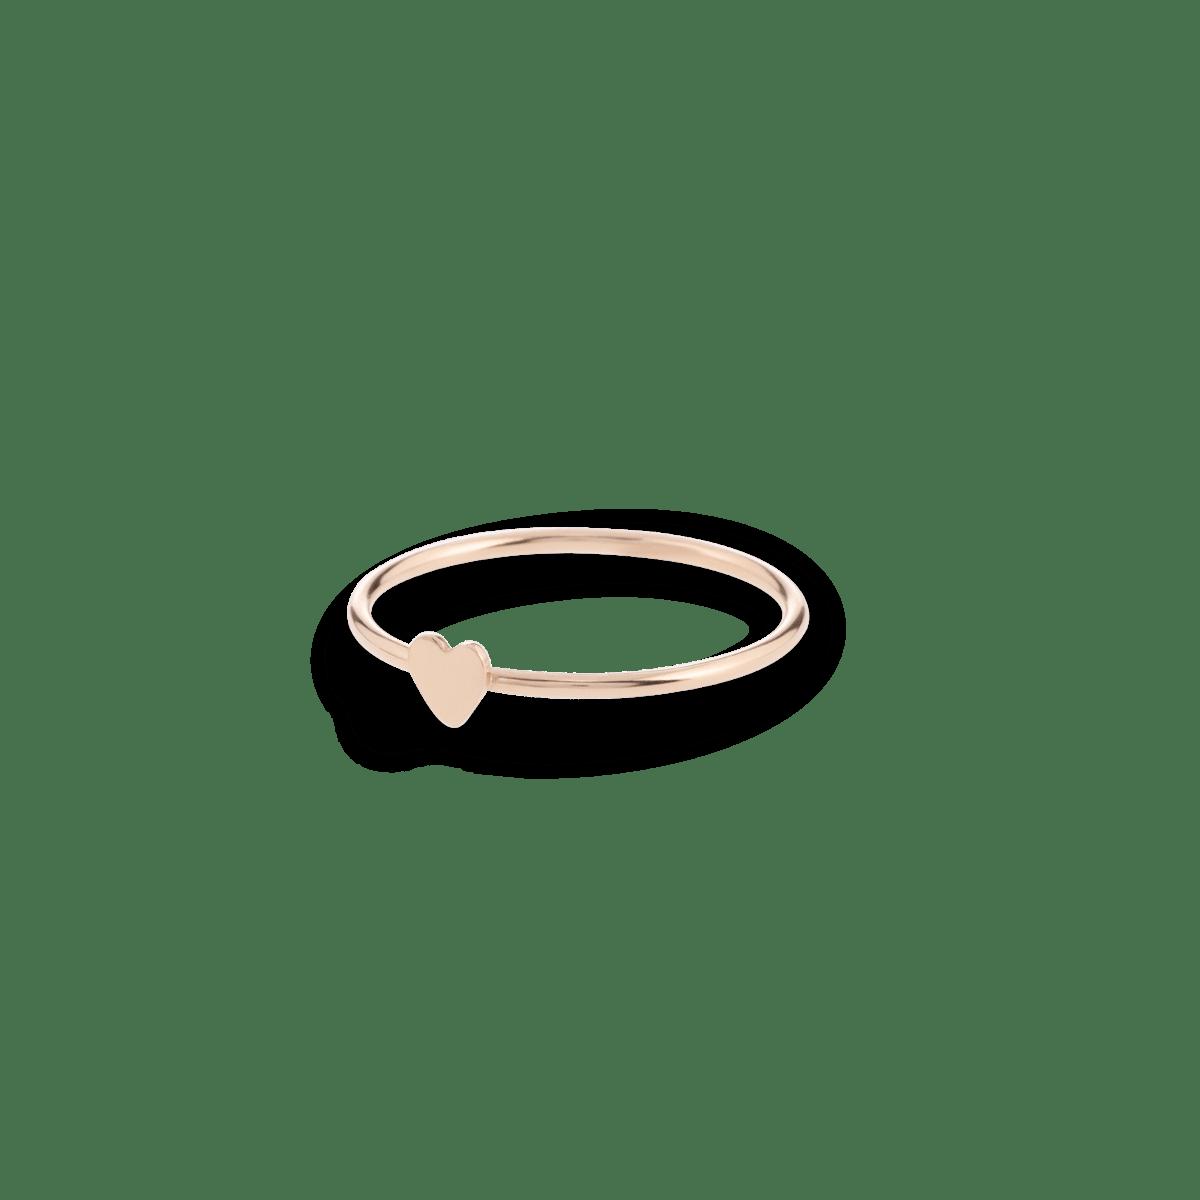 heart ring or rose